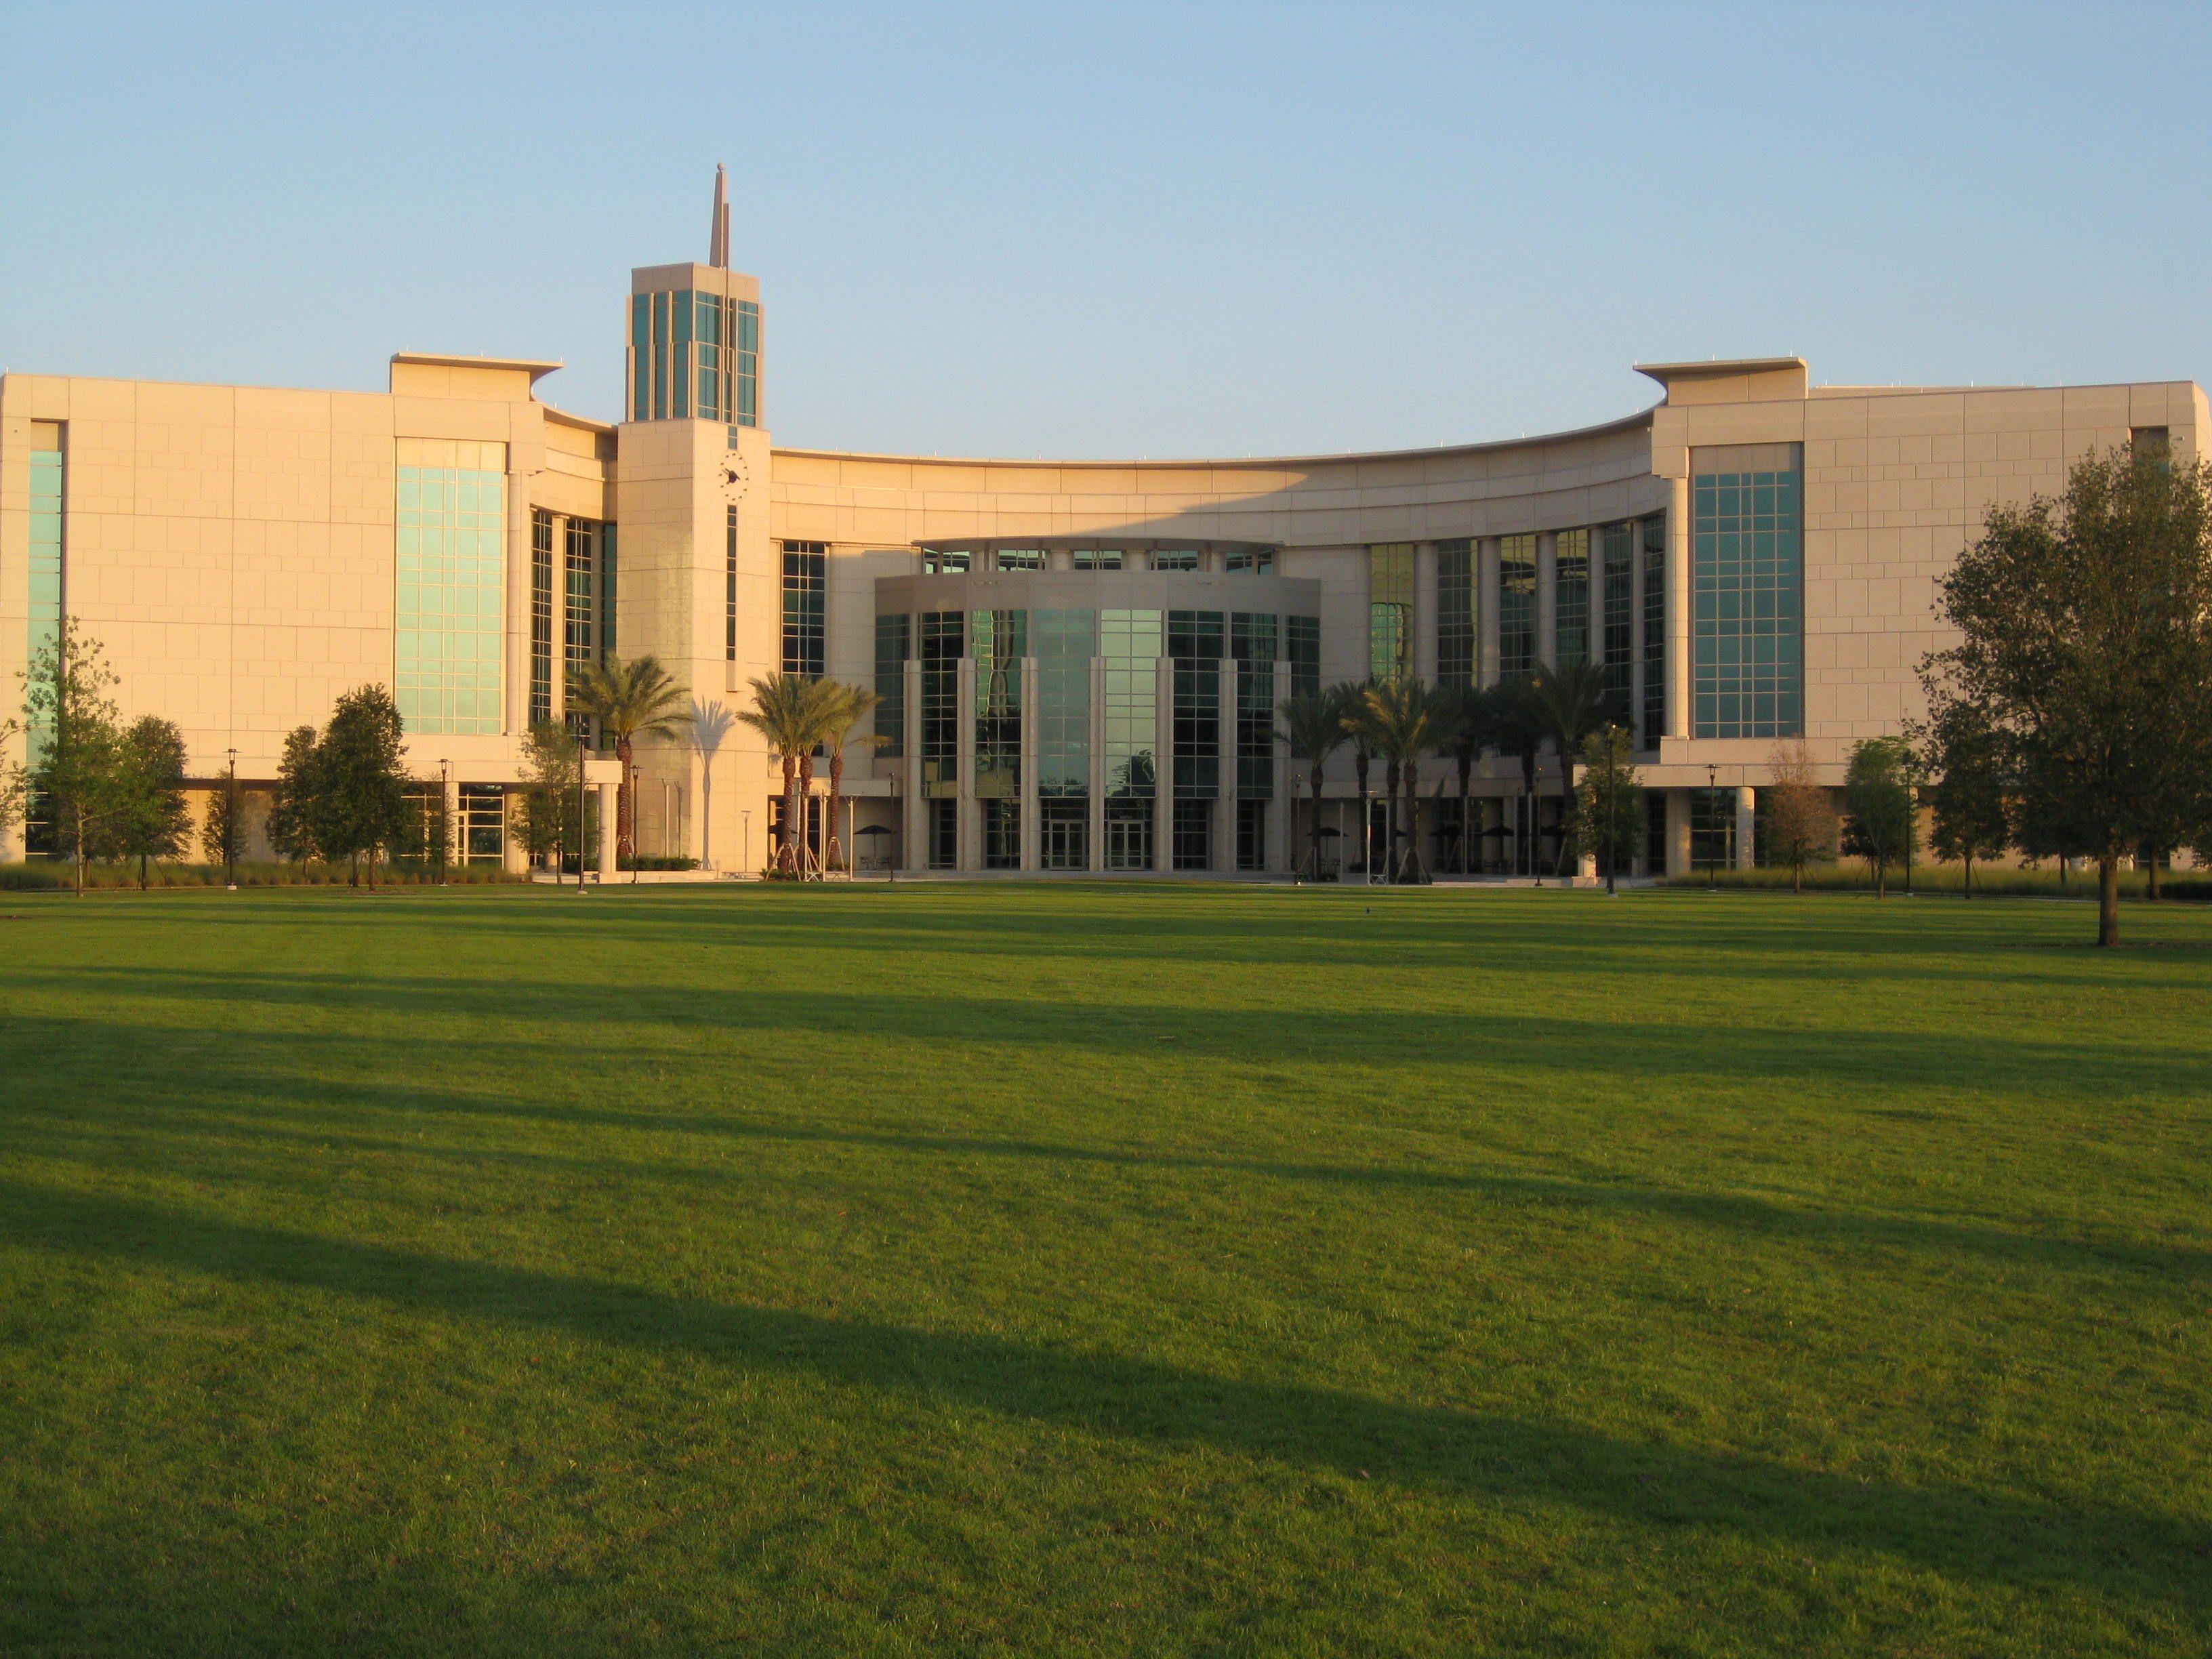 University of Central Florida Health Sciences Campus at